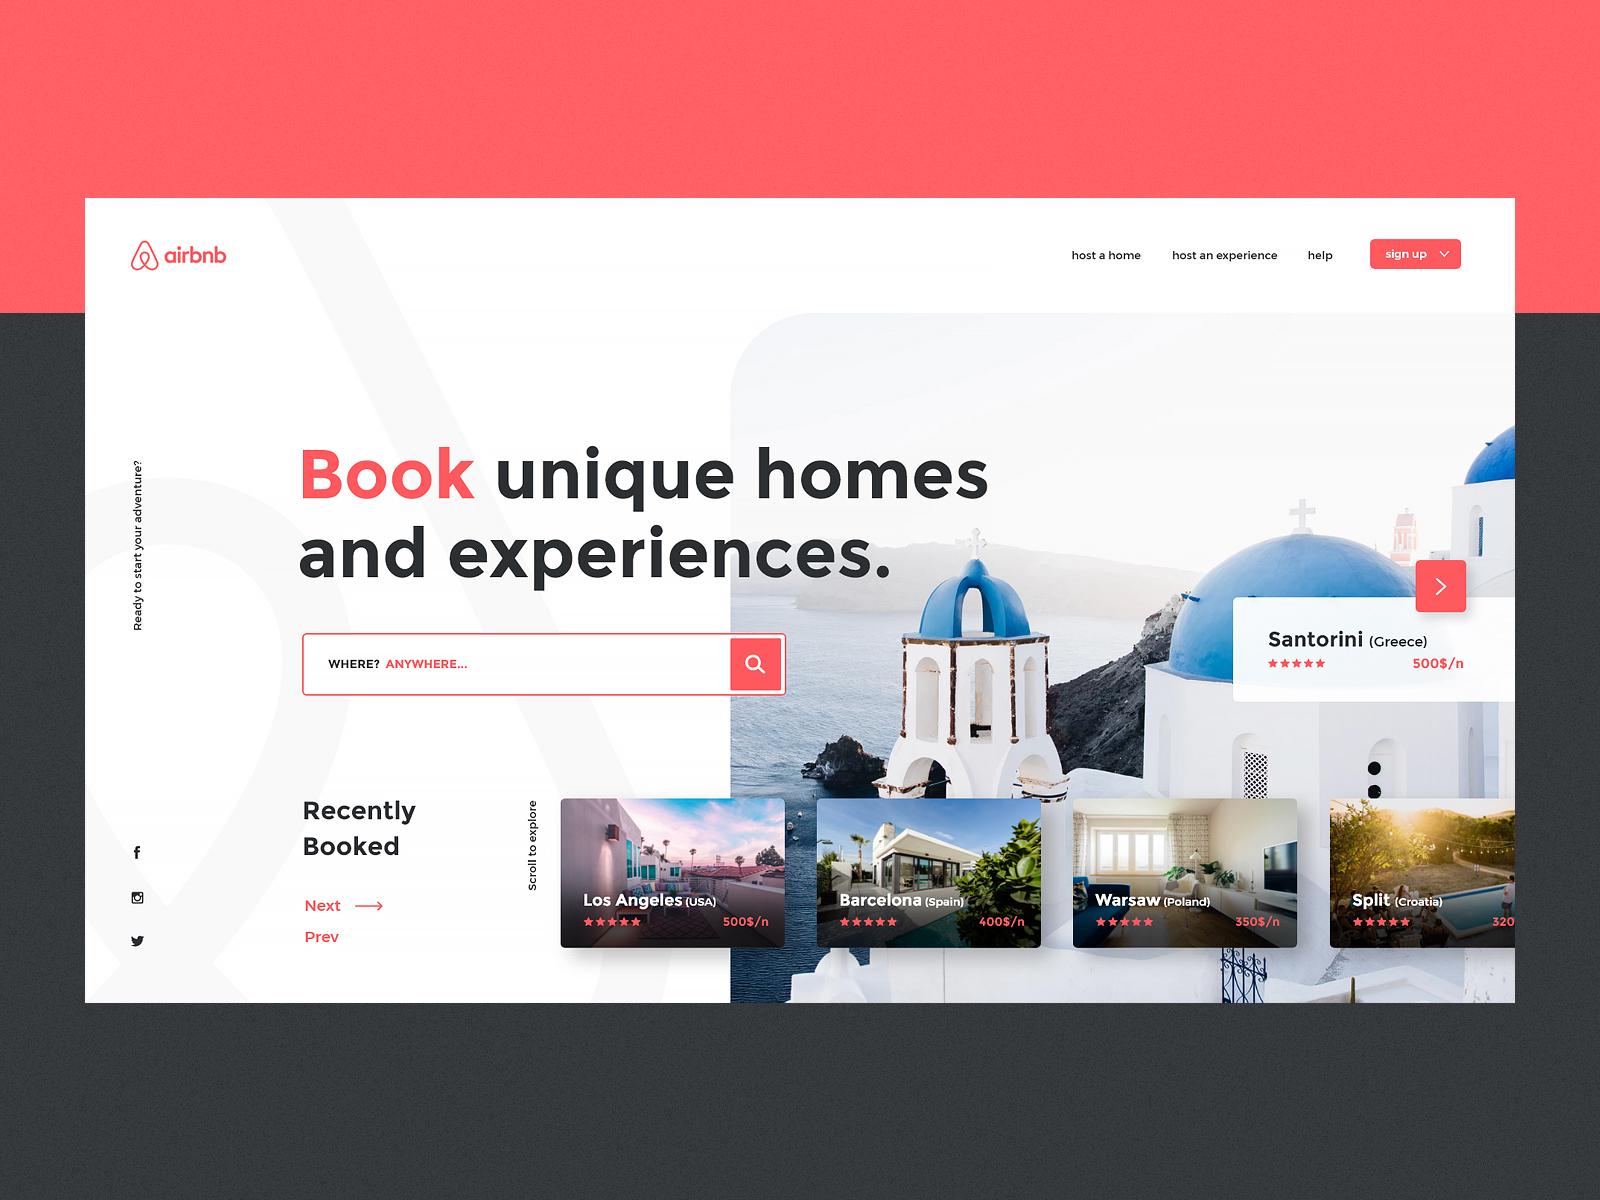 Tourism Website Design Example #2